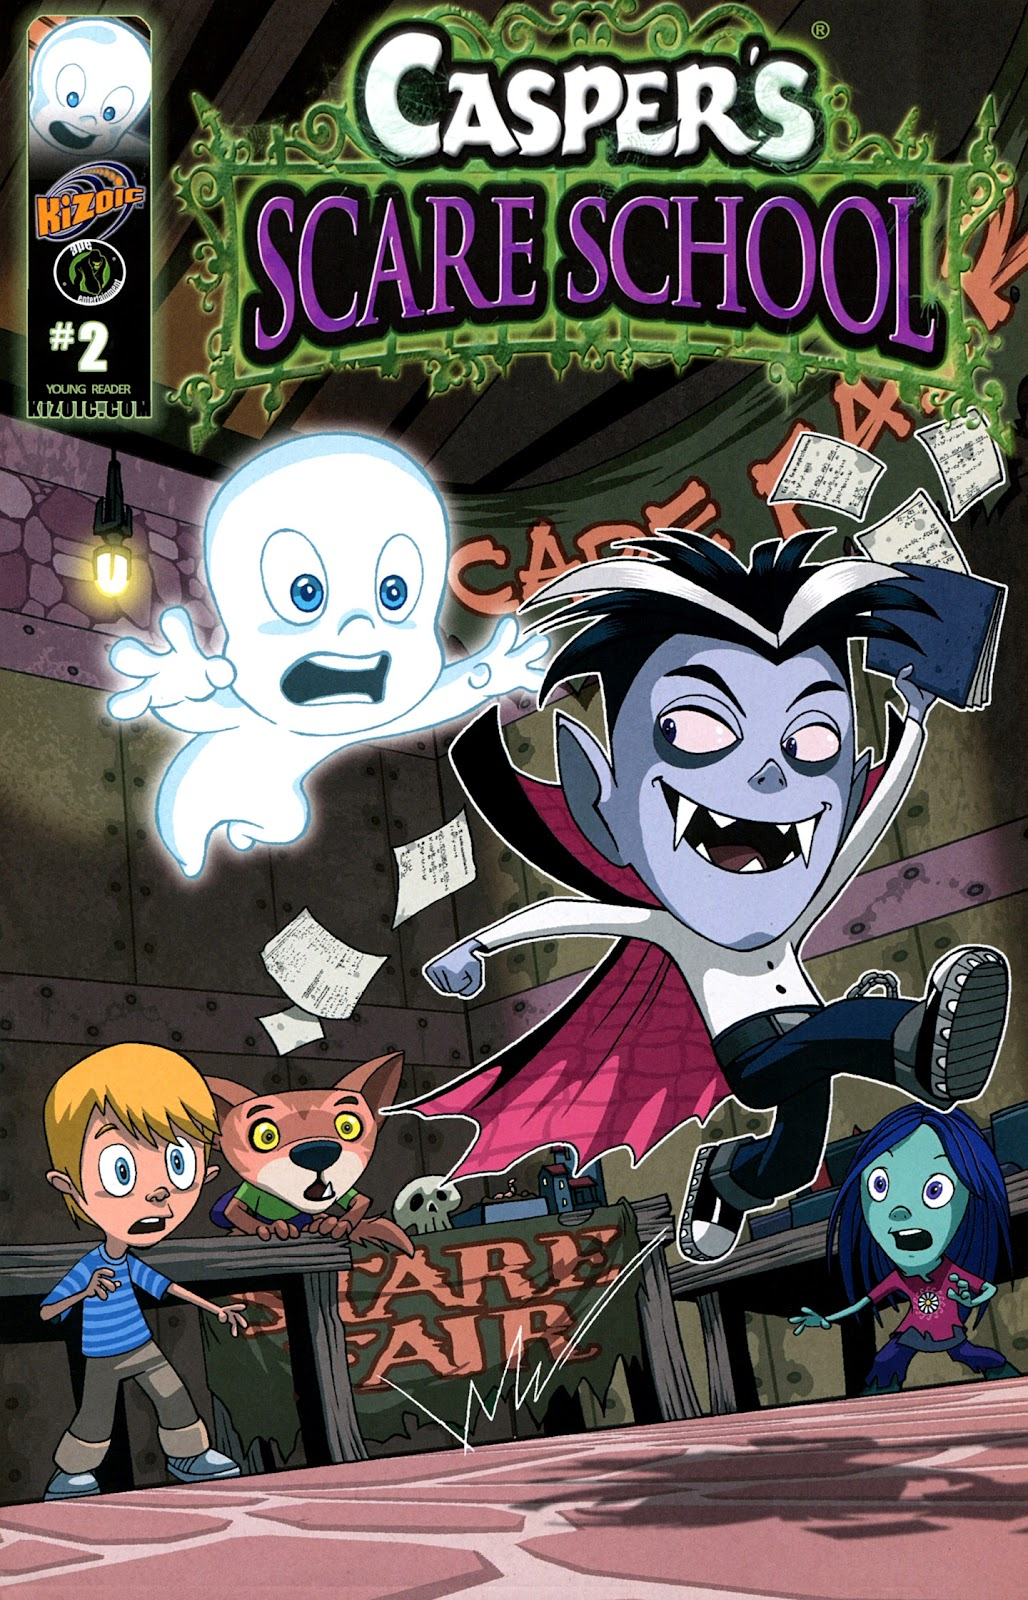 Read online Casper's Scare School comic -  Issue #2 - 1